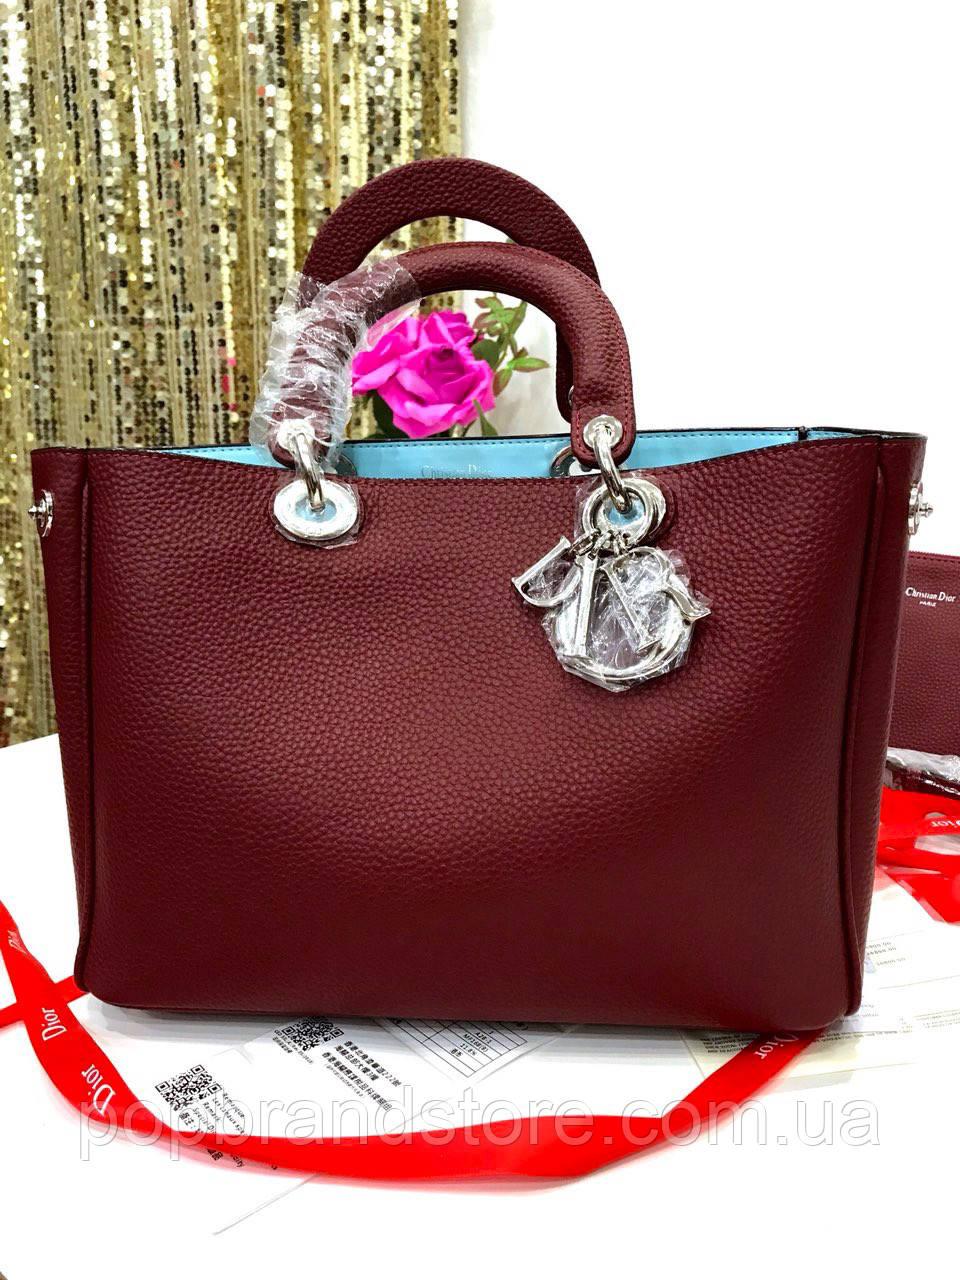 df11e5f4f0a0 Женская кожаная сумка DIOR Diorissimo lux бордо (реплика): продажа ...